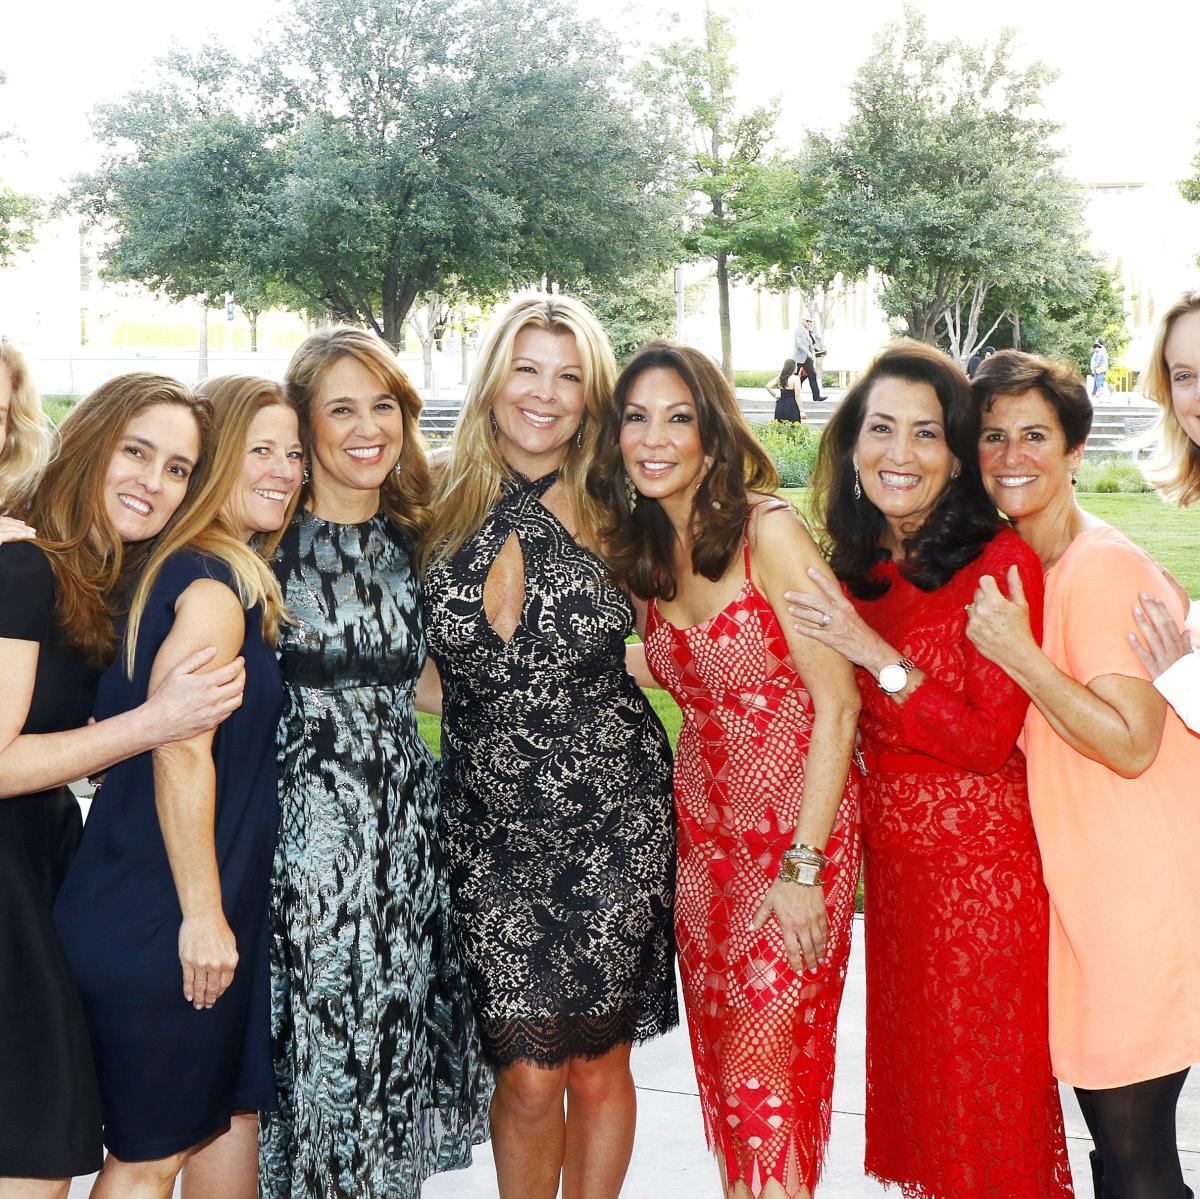 Michelle Moussa, Patricia Reyher, Eleanor Bond, Ann Mahowald, Deanna Mahowald, Cindy Pierce, Debra Hitzelberger, Melinda Johnson, Ann Wood